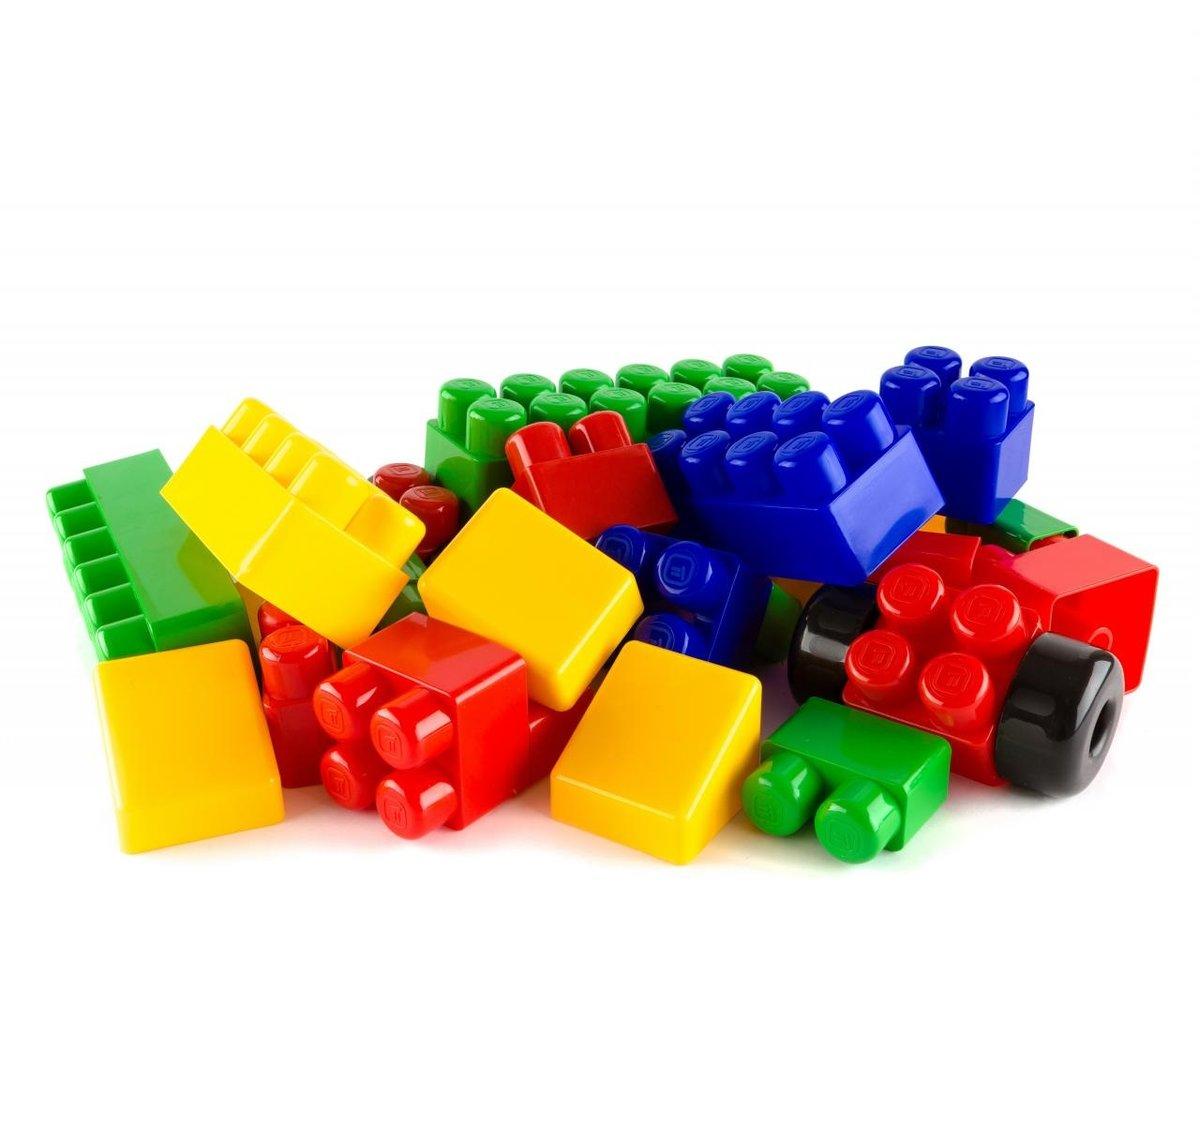 Конструктор игрушки картинки